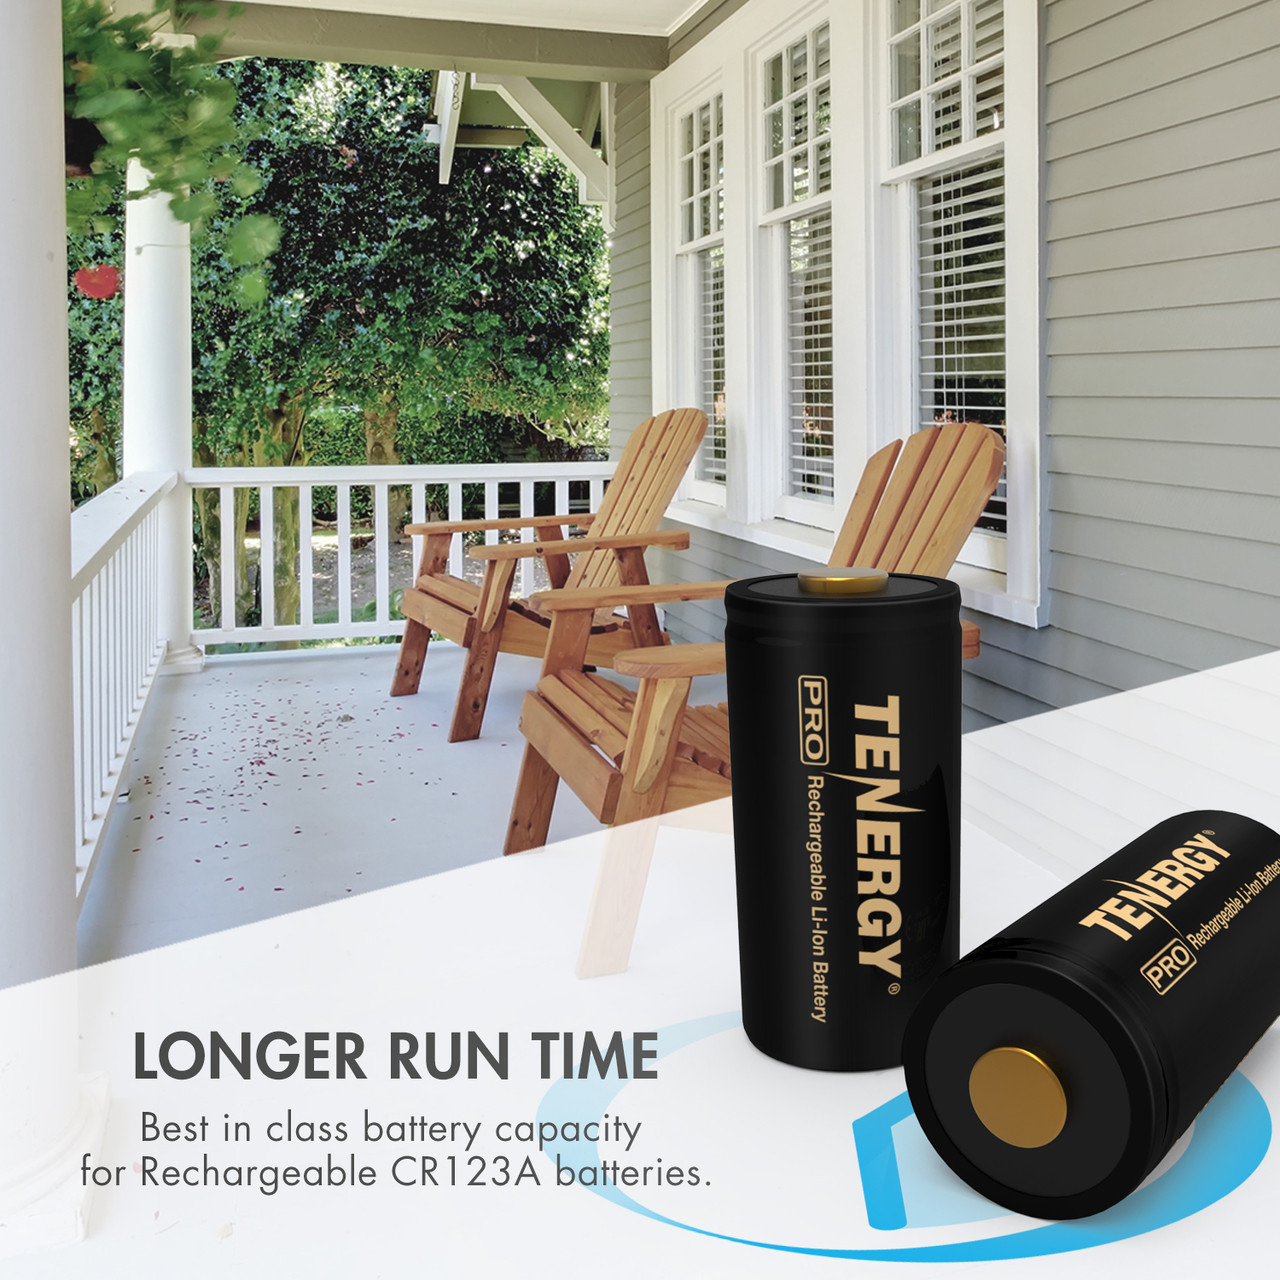 Premium High Capacity Rechargeable Batteries (24-Pack) Arlo Certified Li-ion 3.7V 750mAh